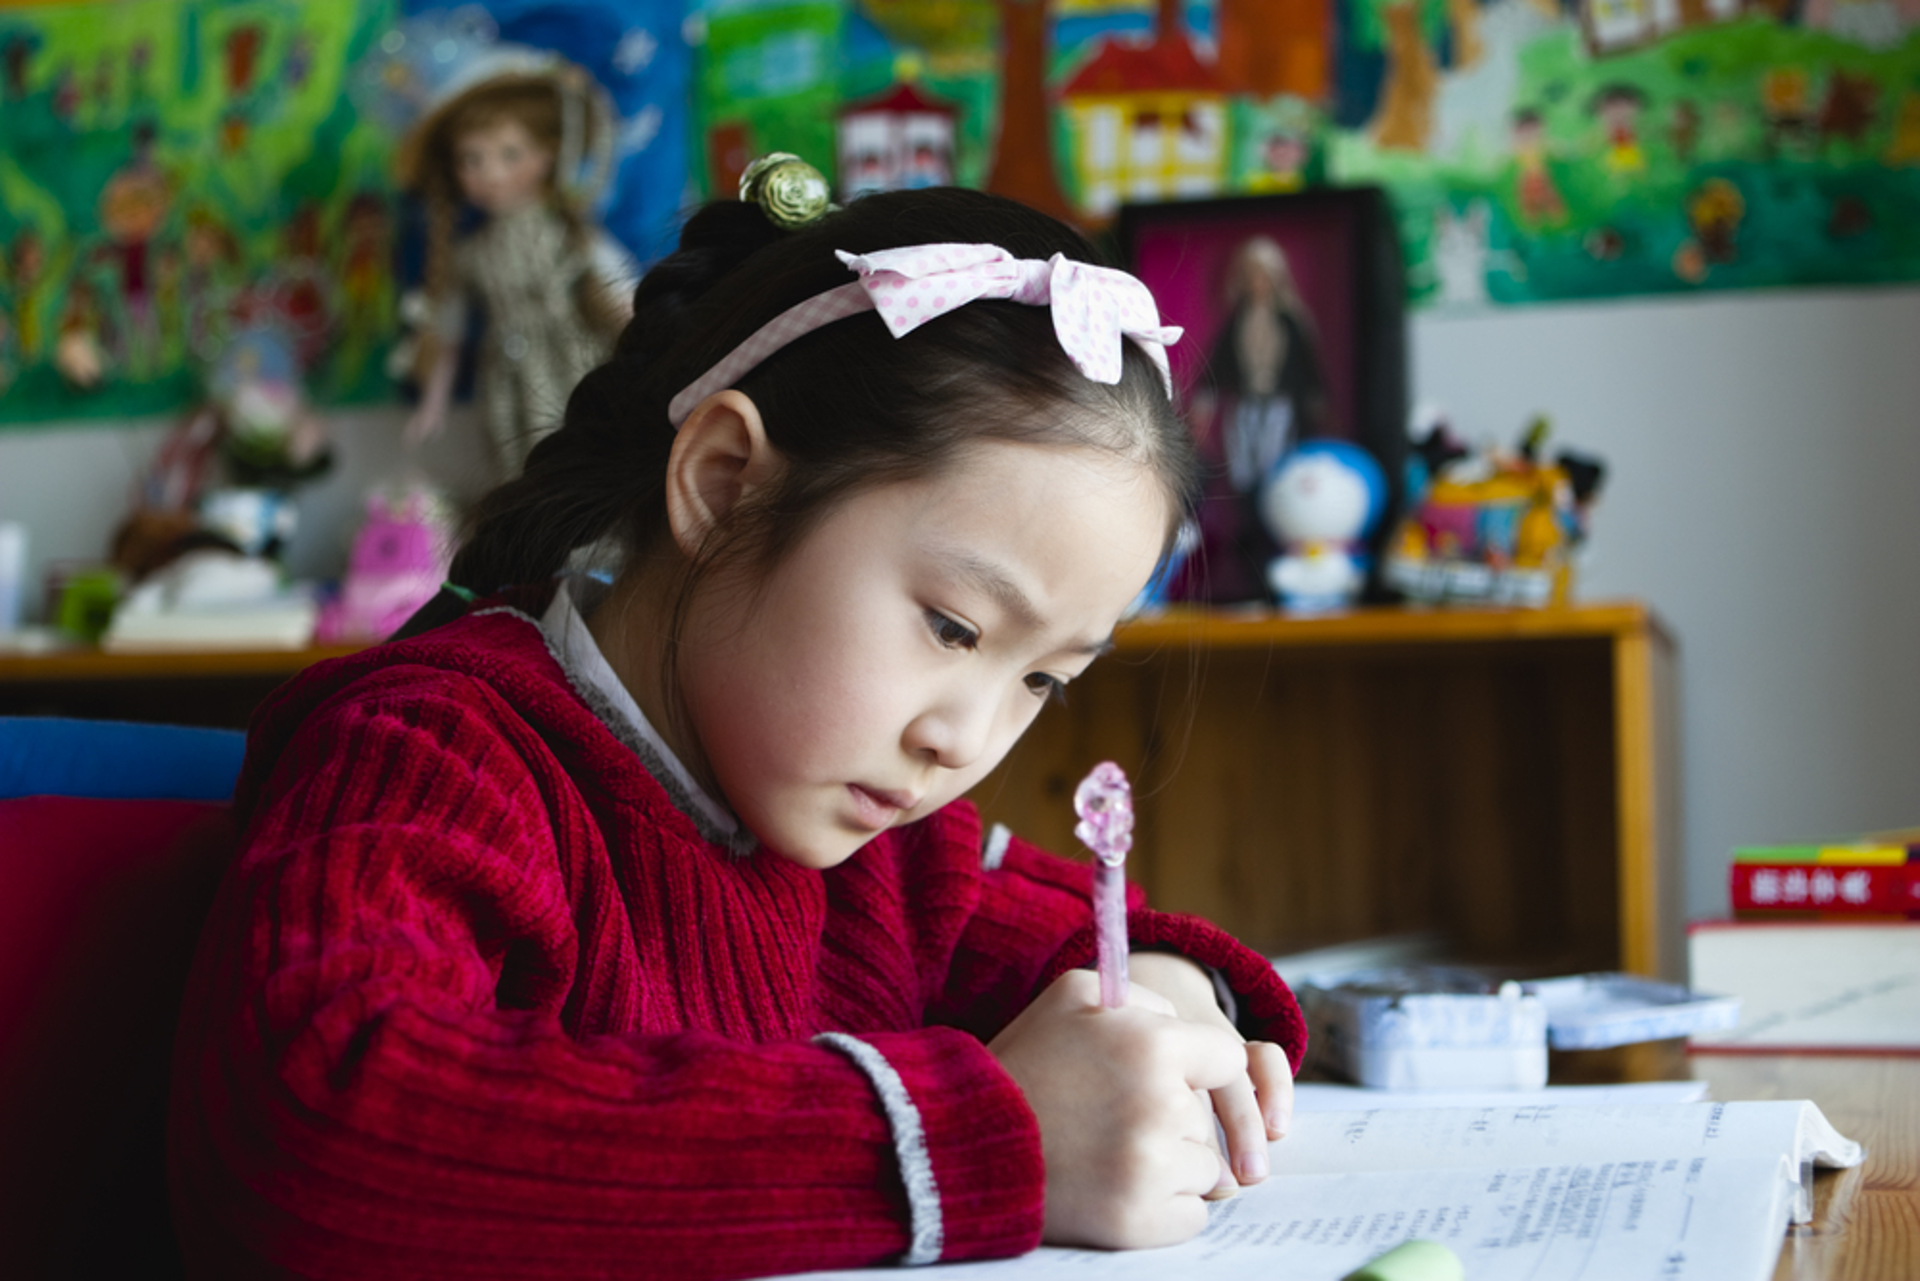 How East Asian children get so far ahead of their classmates